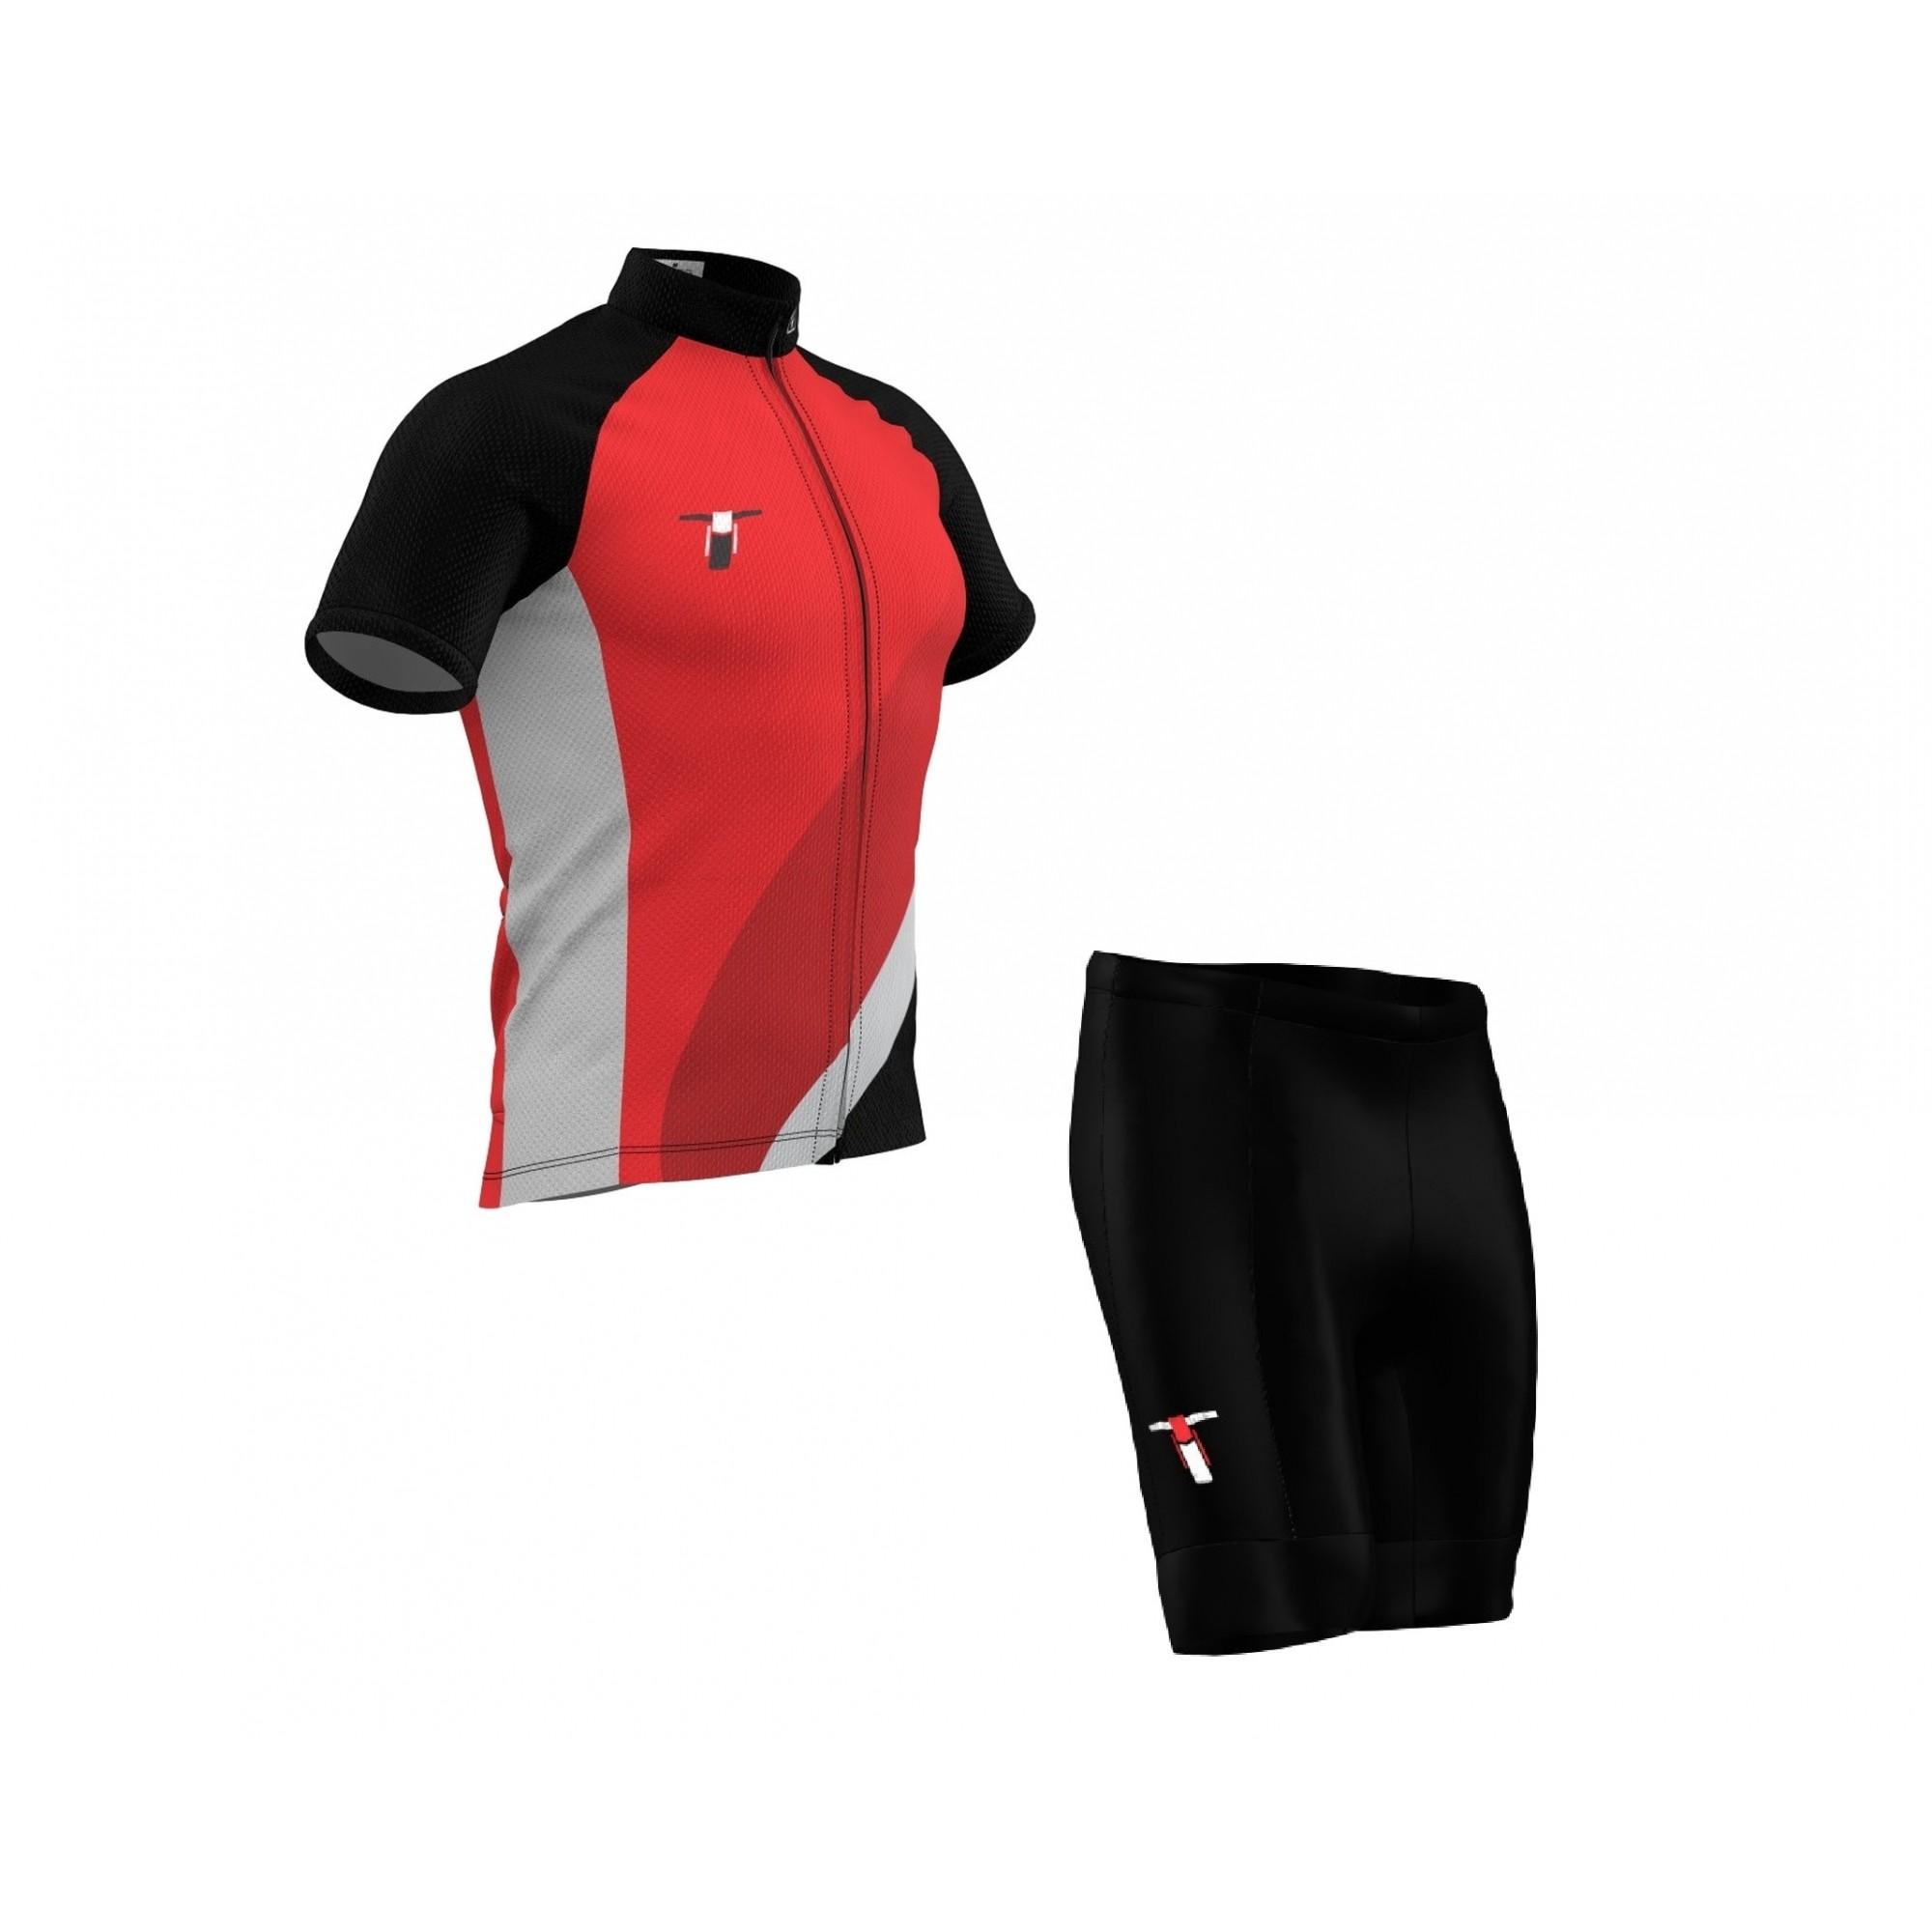 Conjunto Bermuda + Camisa Tribos e Trilhas Red